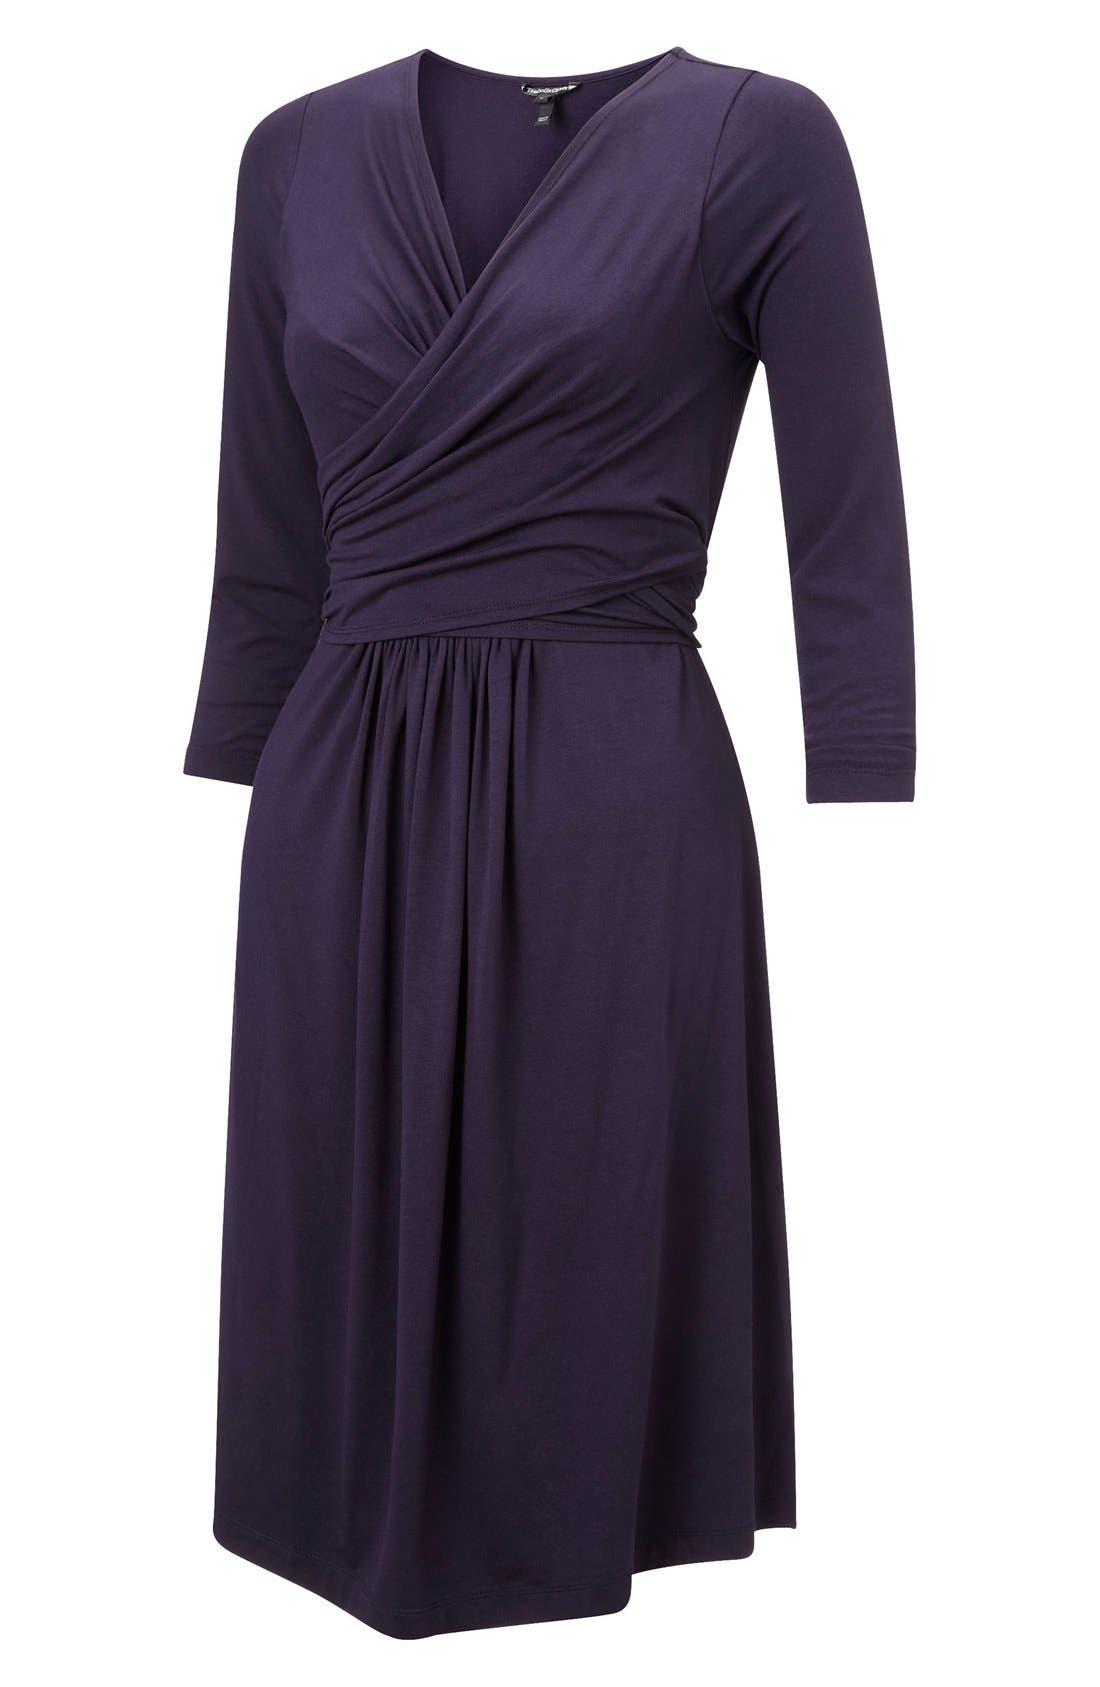 'Avebury' Nursing Wrap Maternity Dress,                         Main,                         color, Darkest Navy